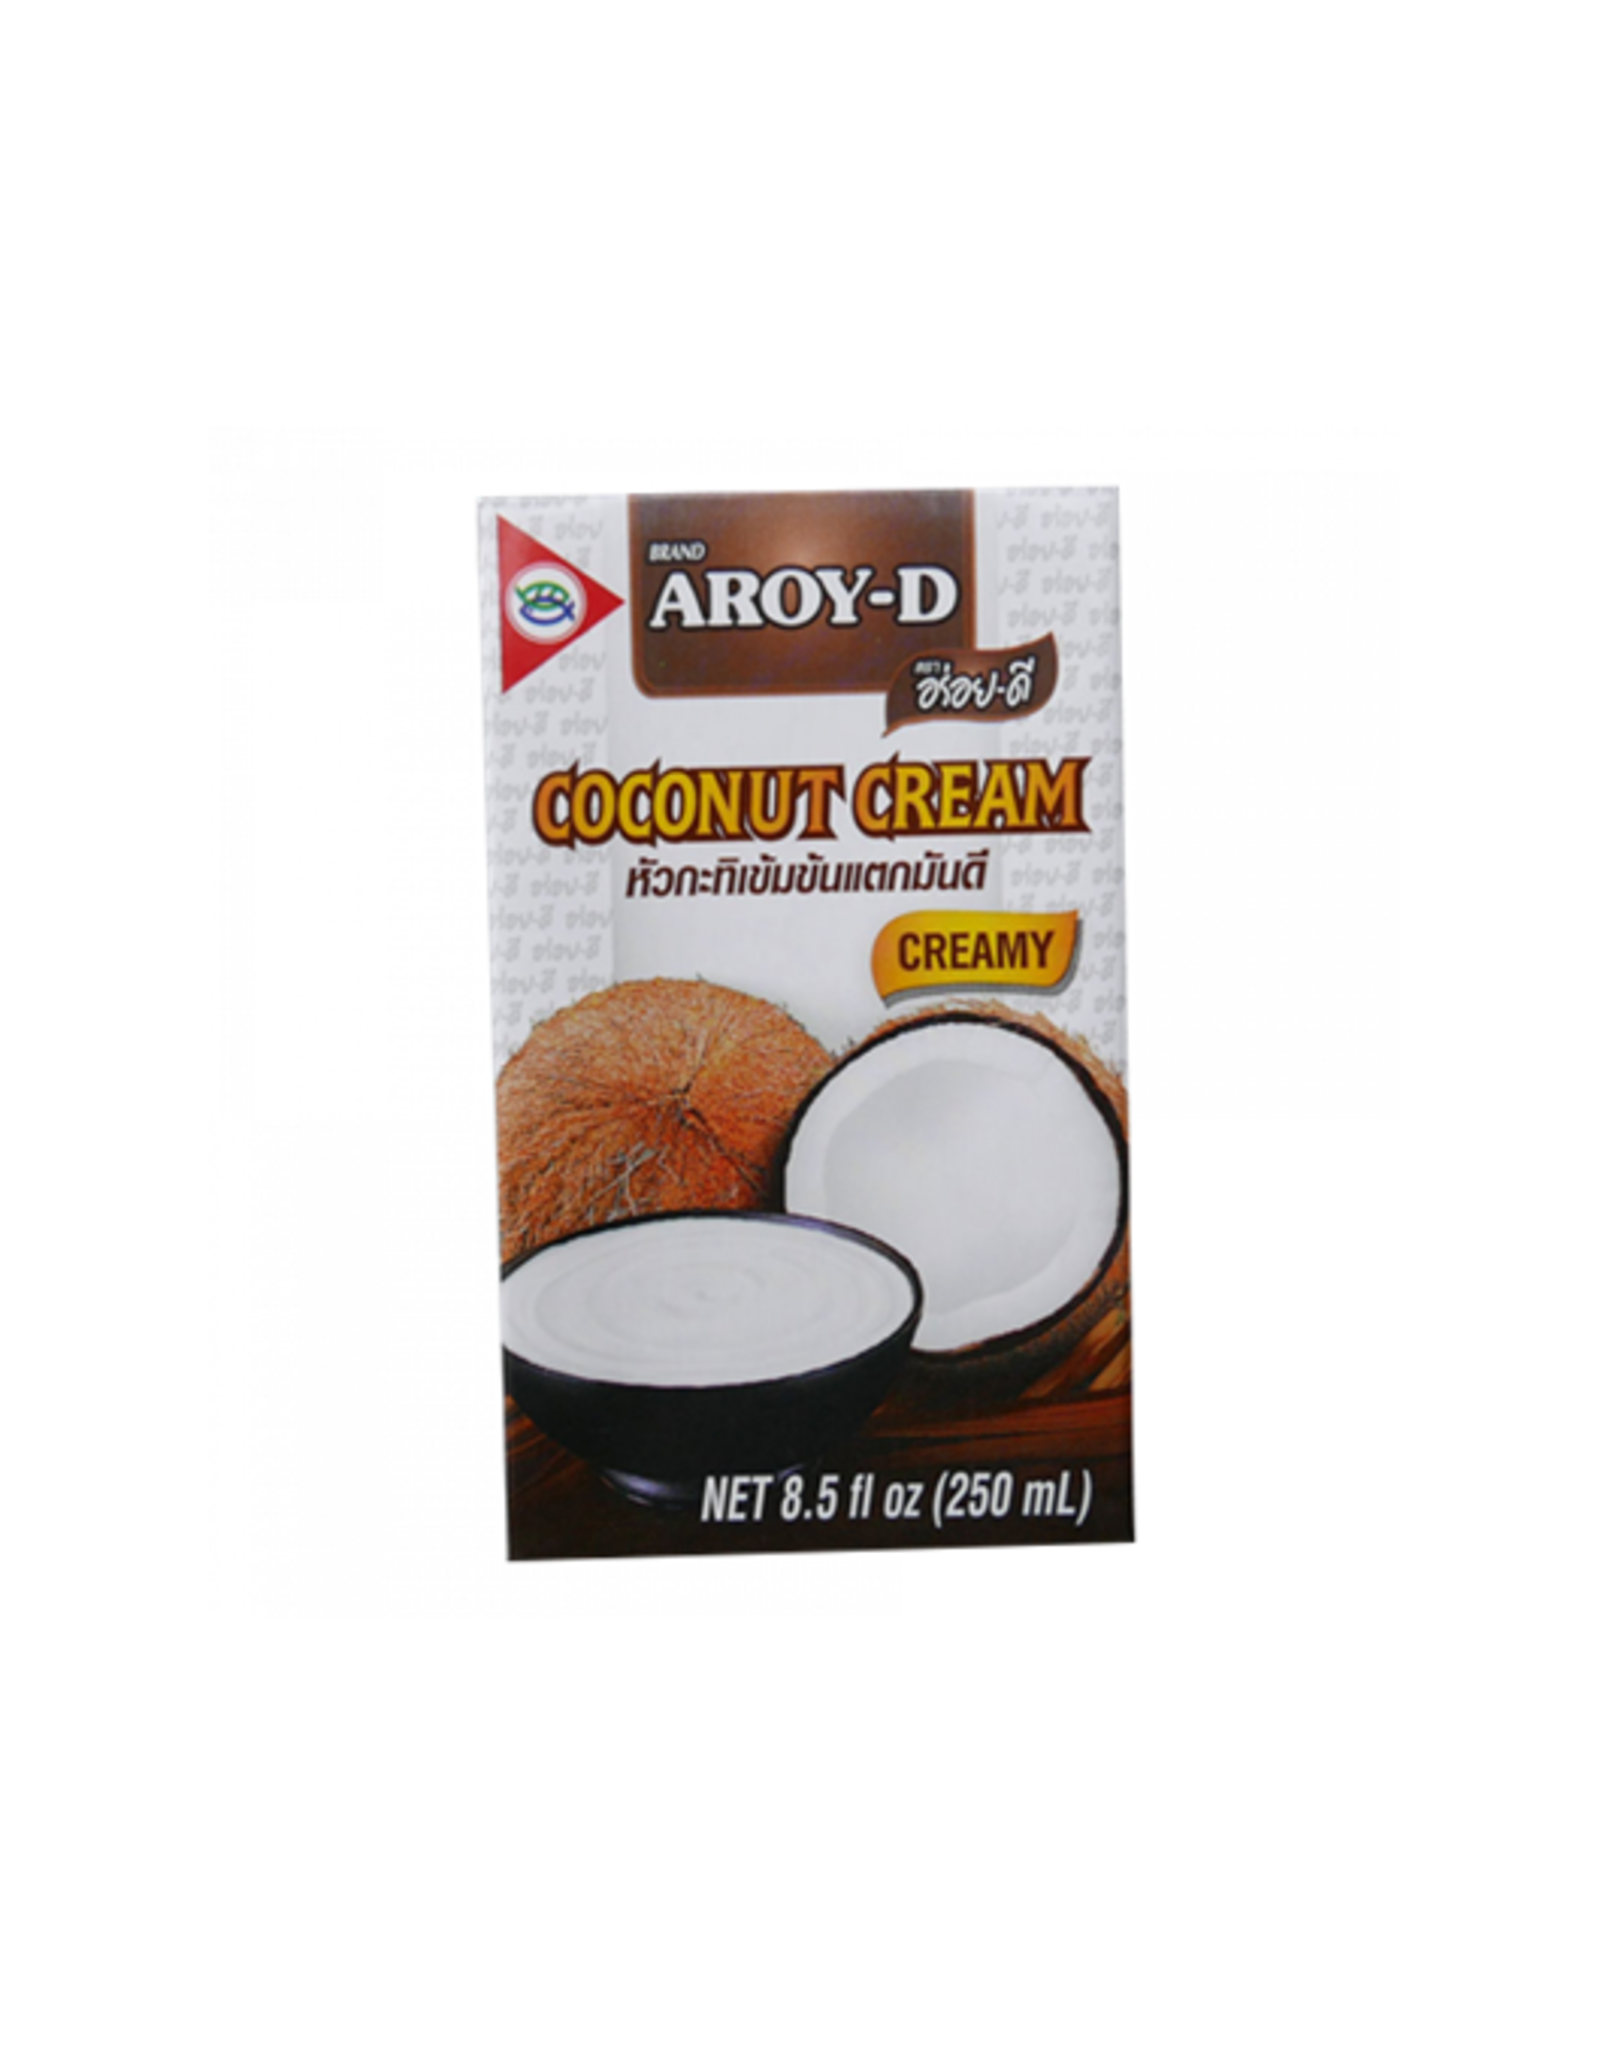 Aroy-D Coconut Cream 250ml